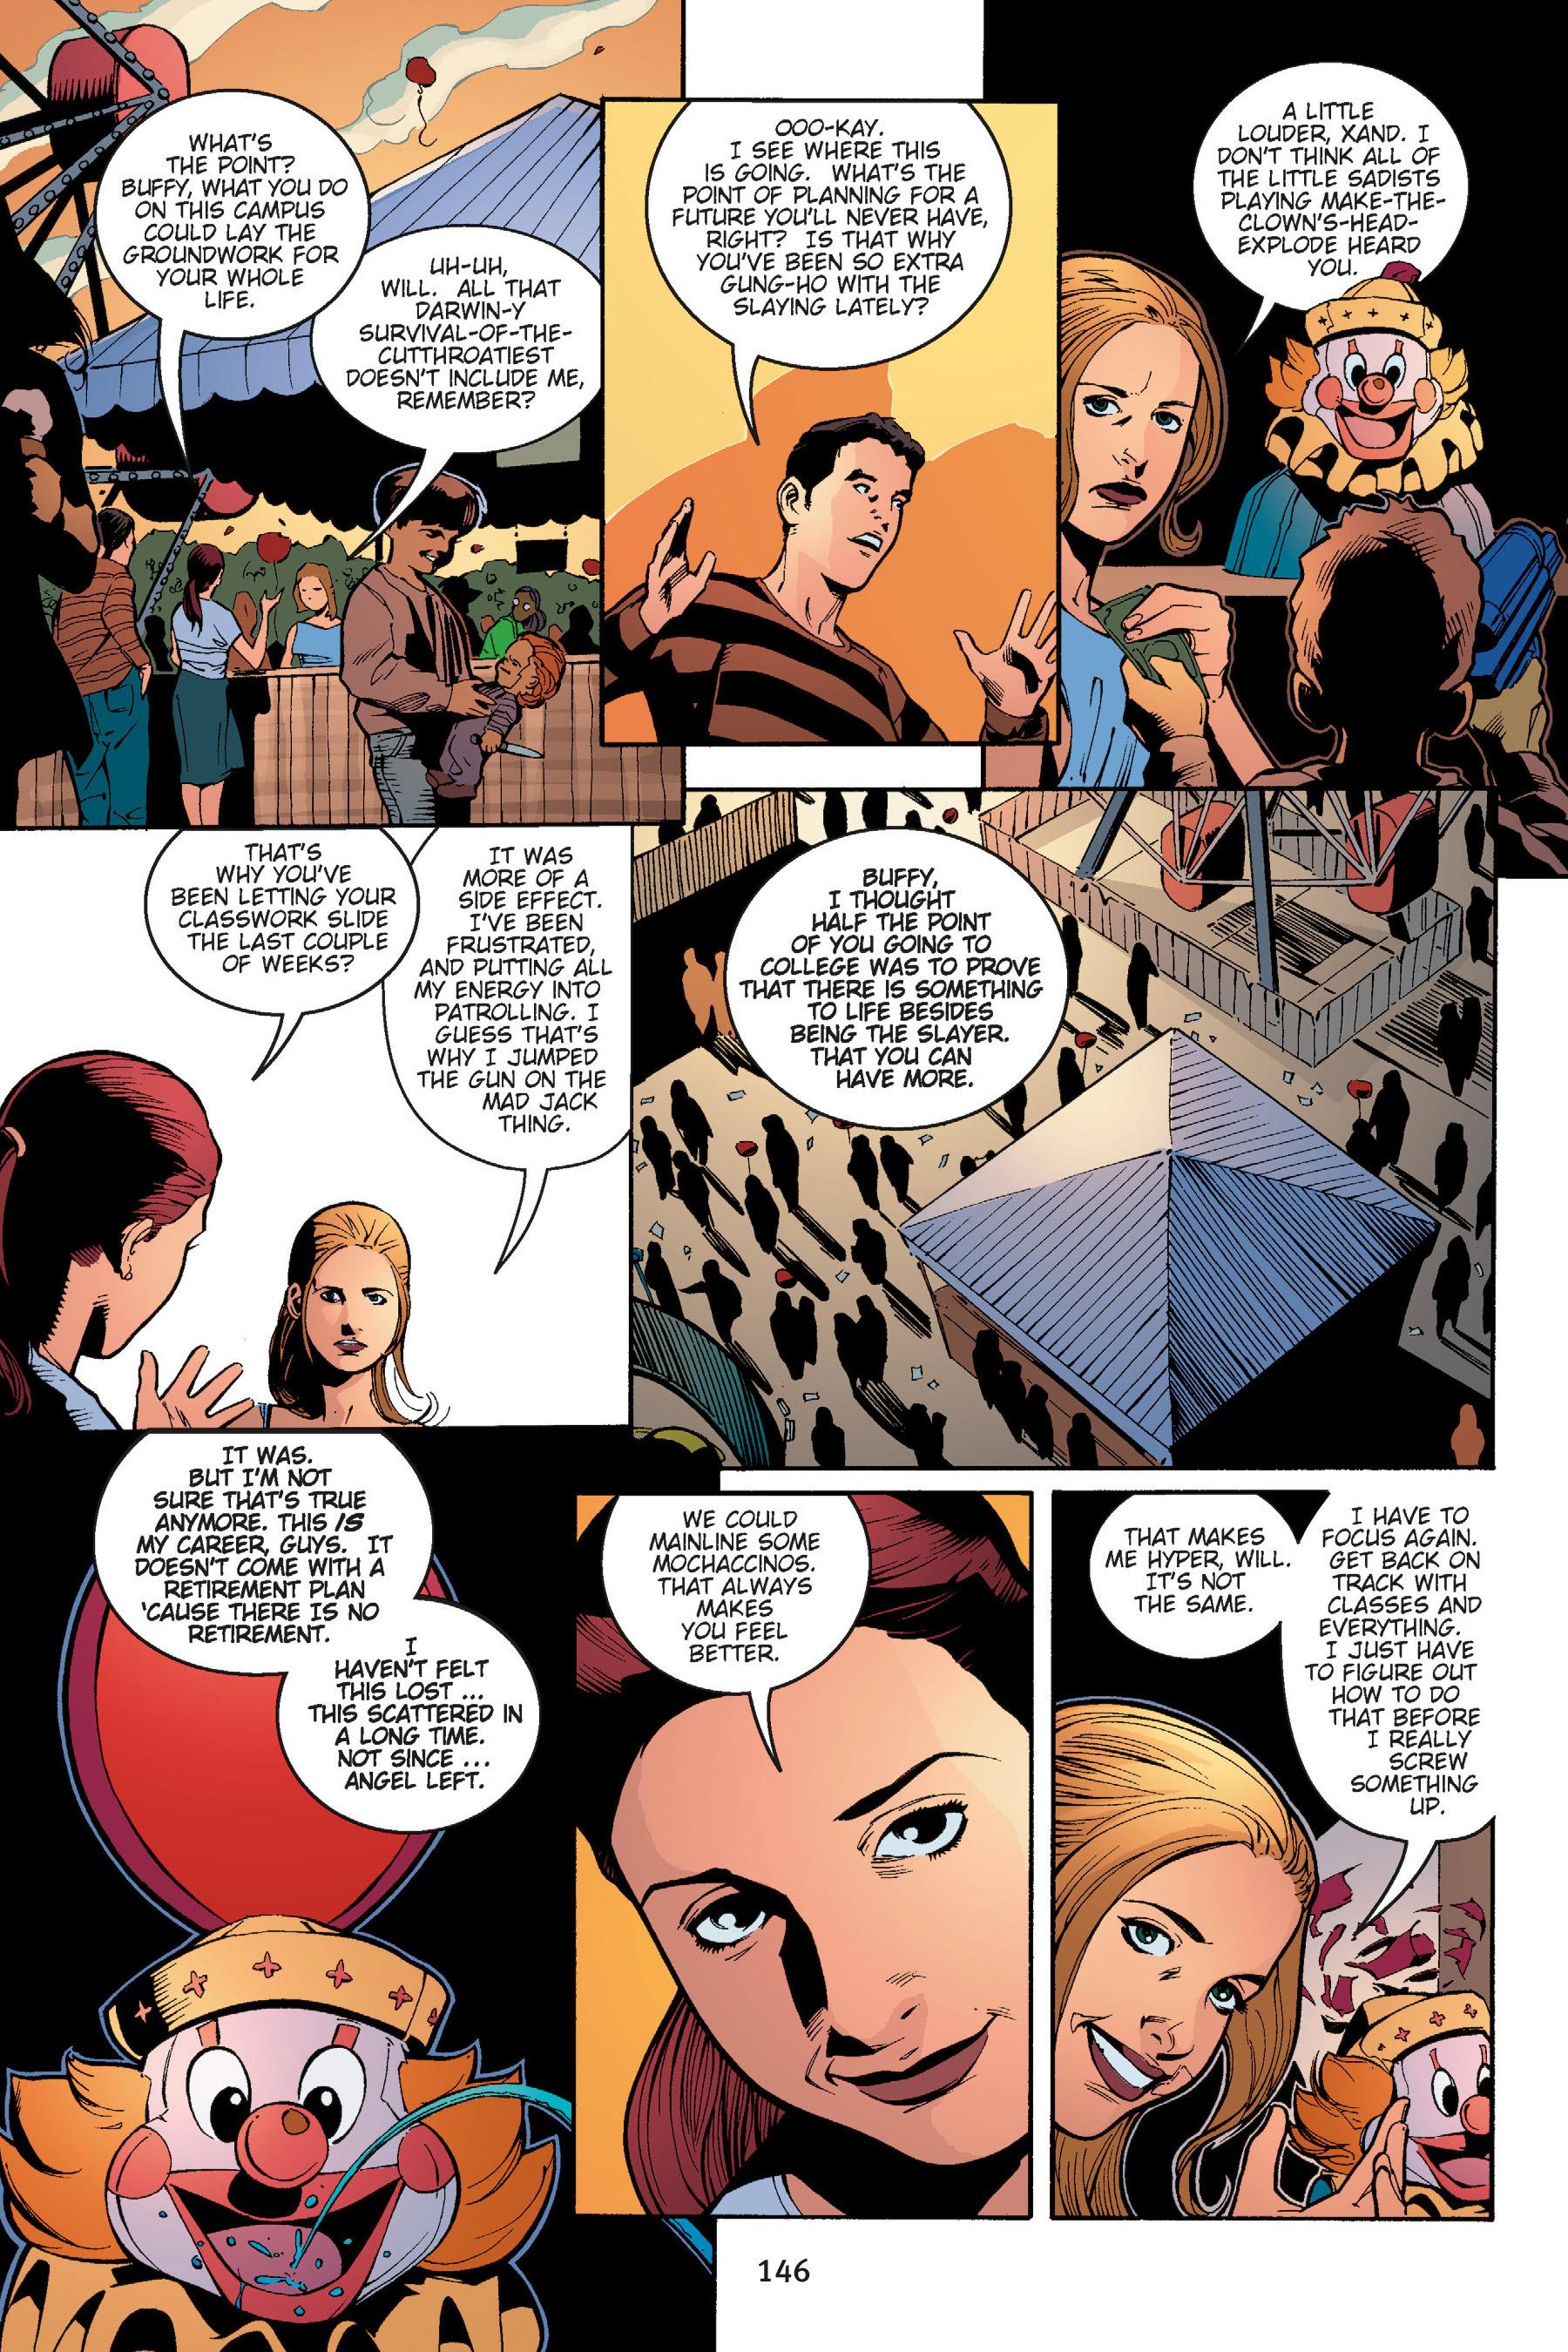 Read online Buffy the Vampire Slayer: Omnibus comic -  Issue # TPB 5 - 146